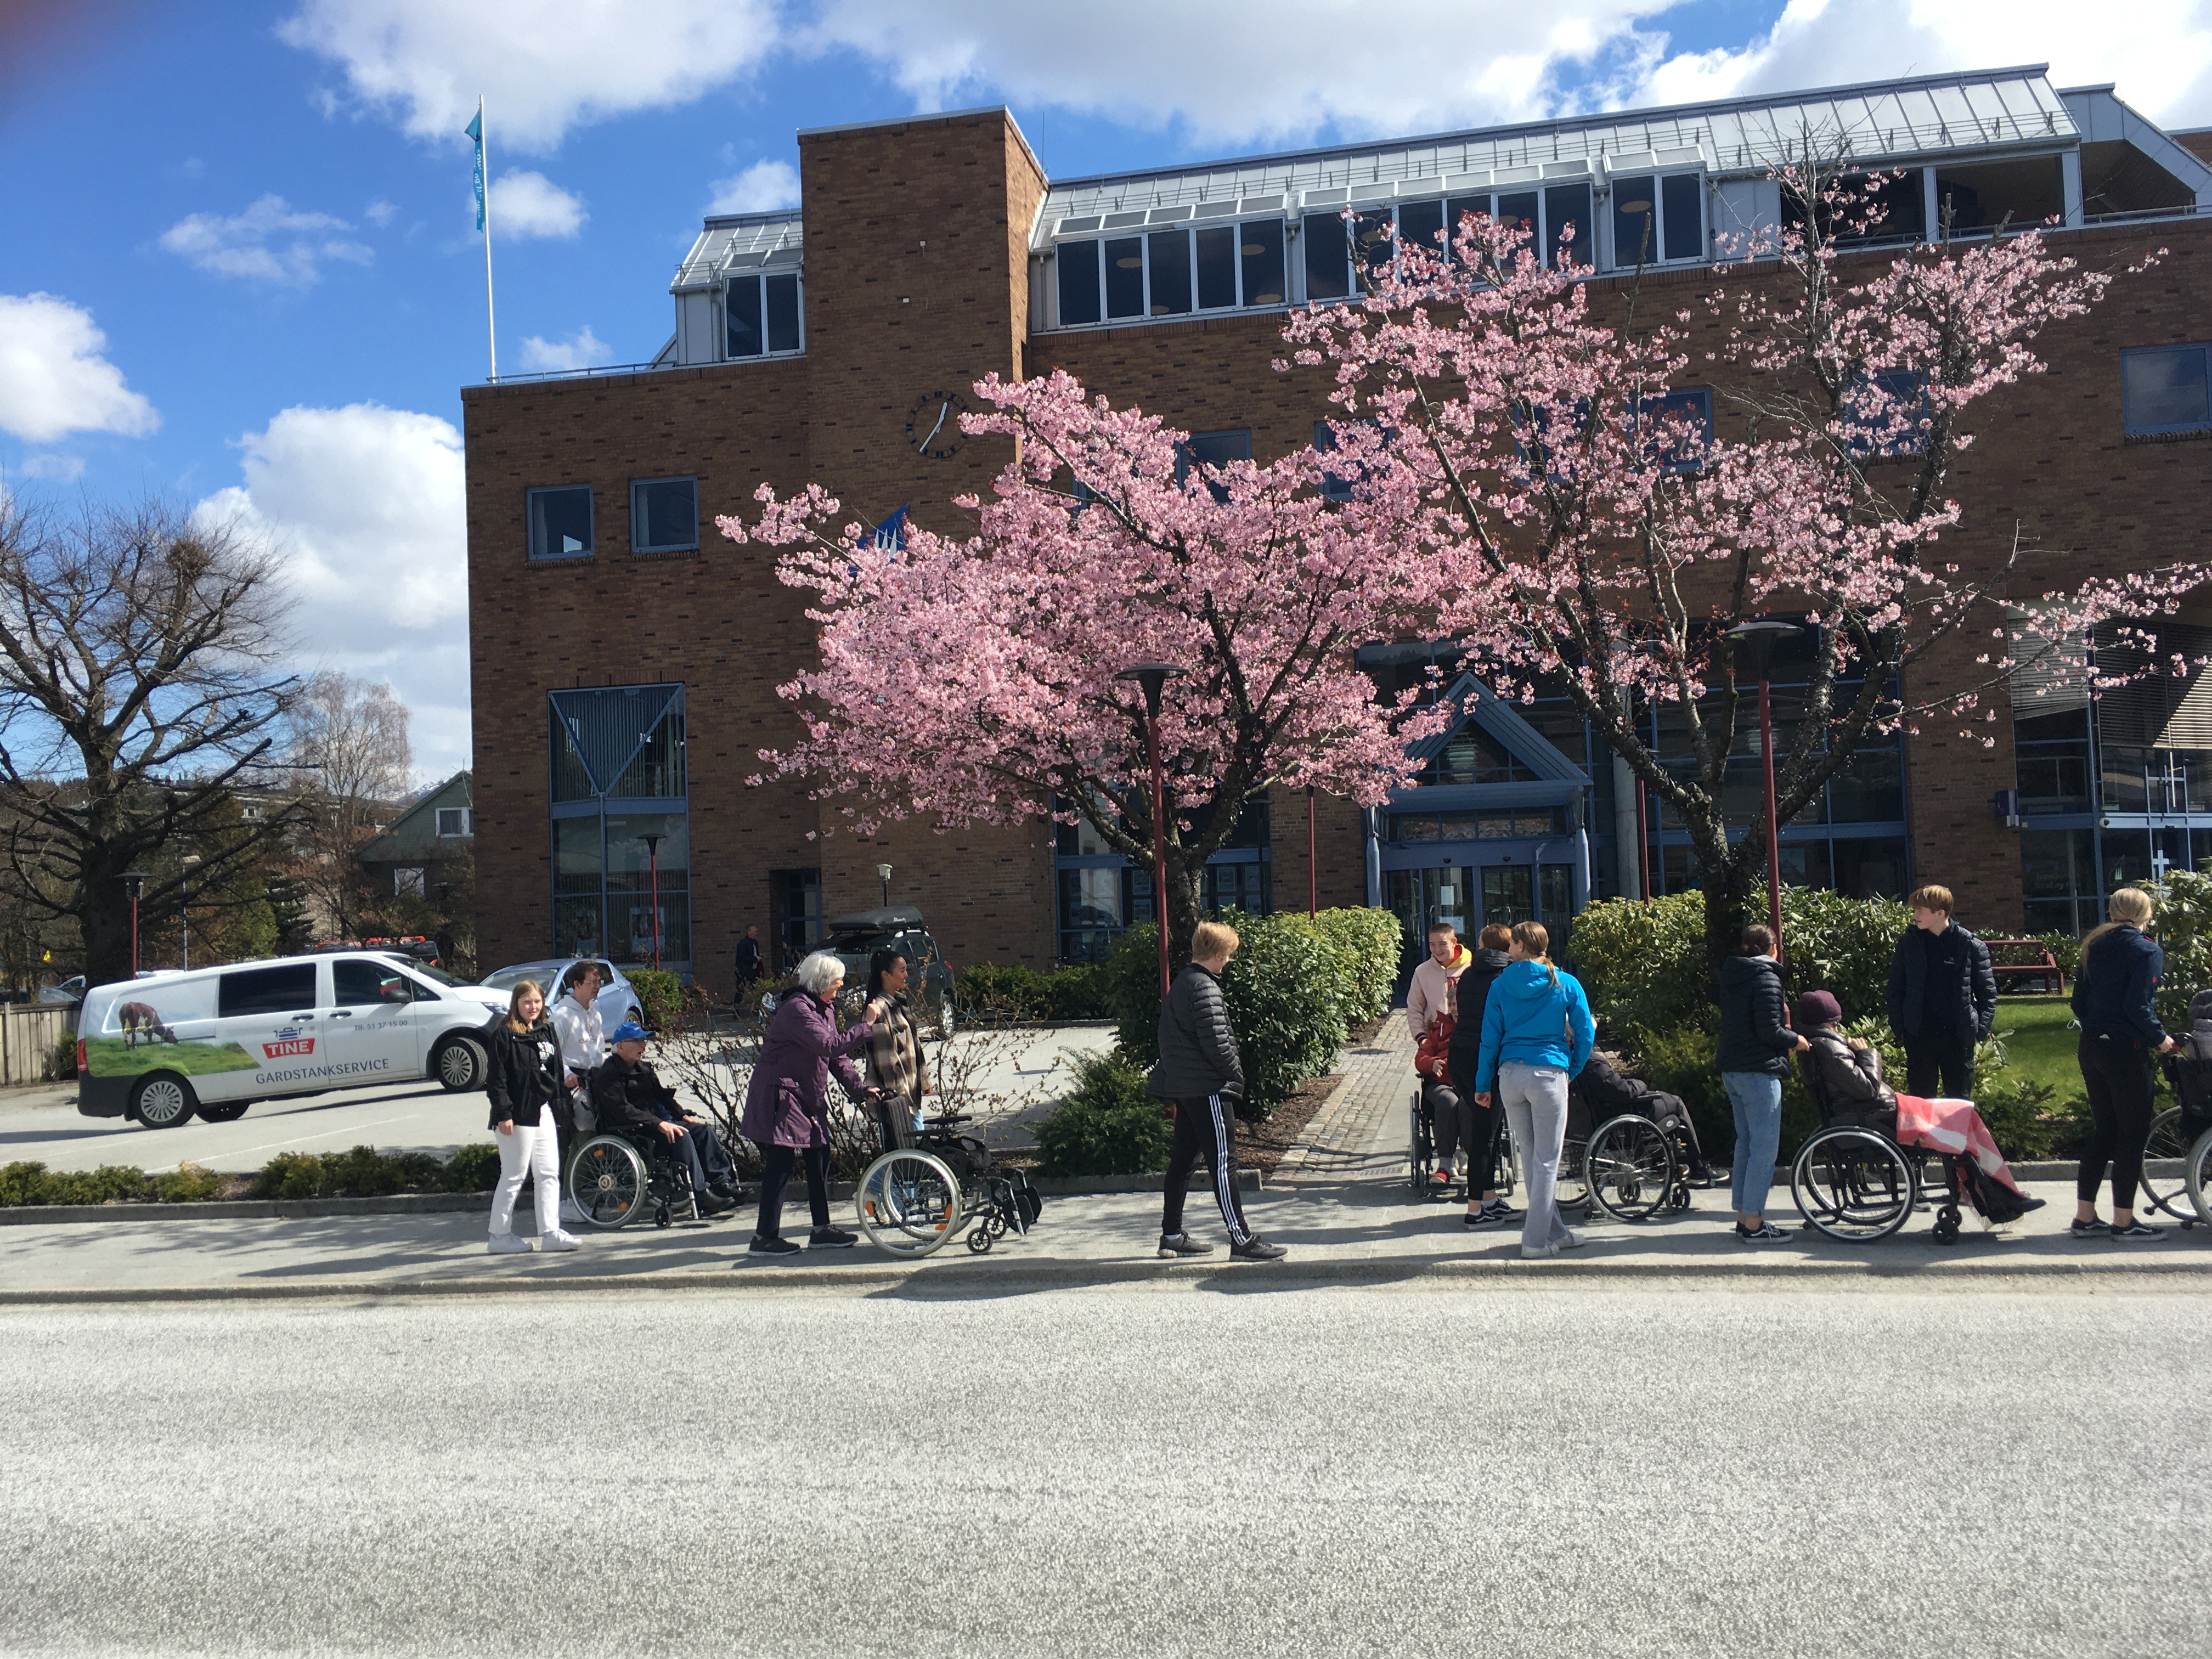 Ei gruppe ungdom som triller rullestolar med eldre forbi banken